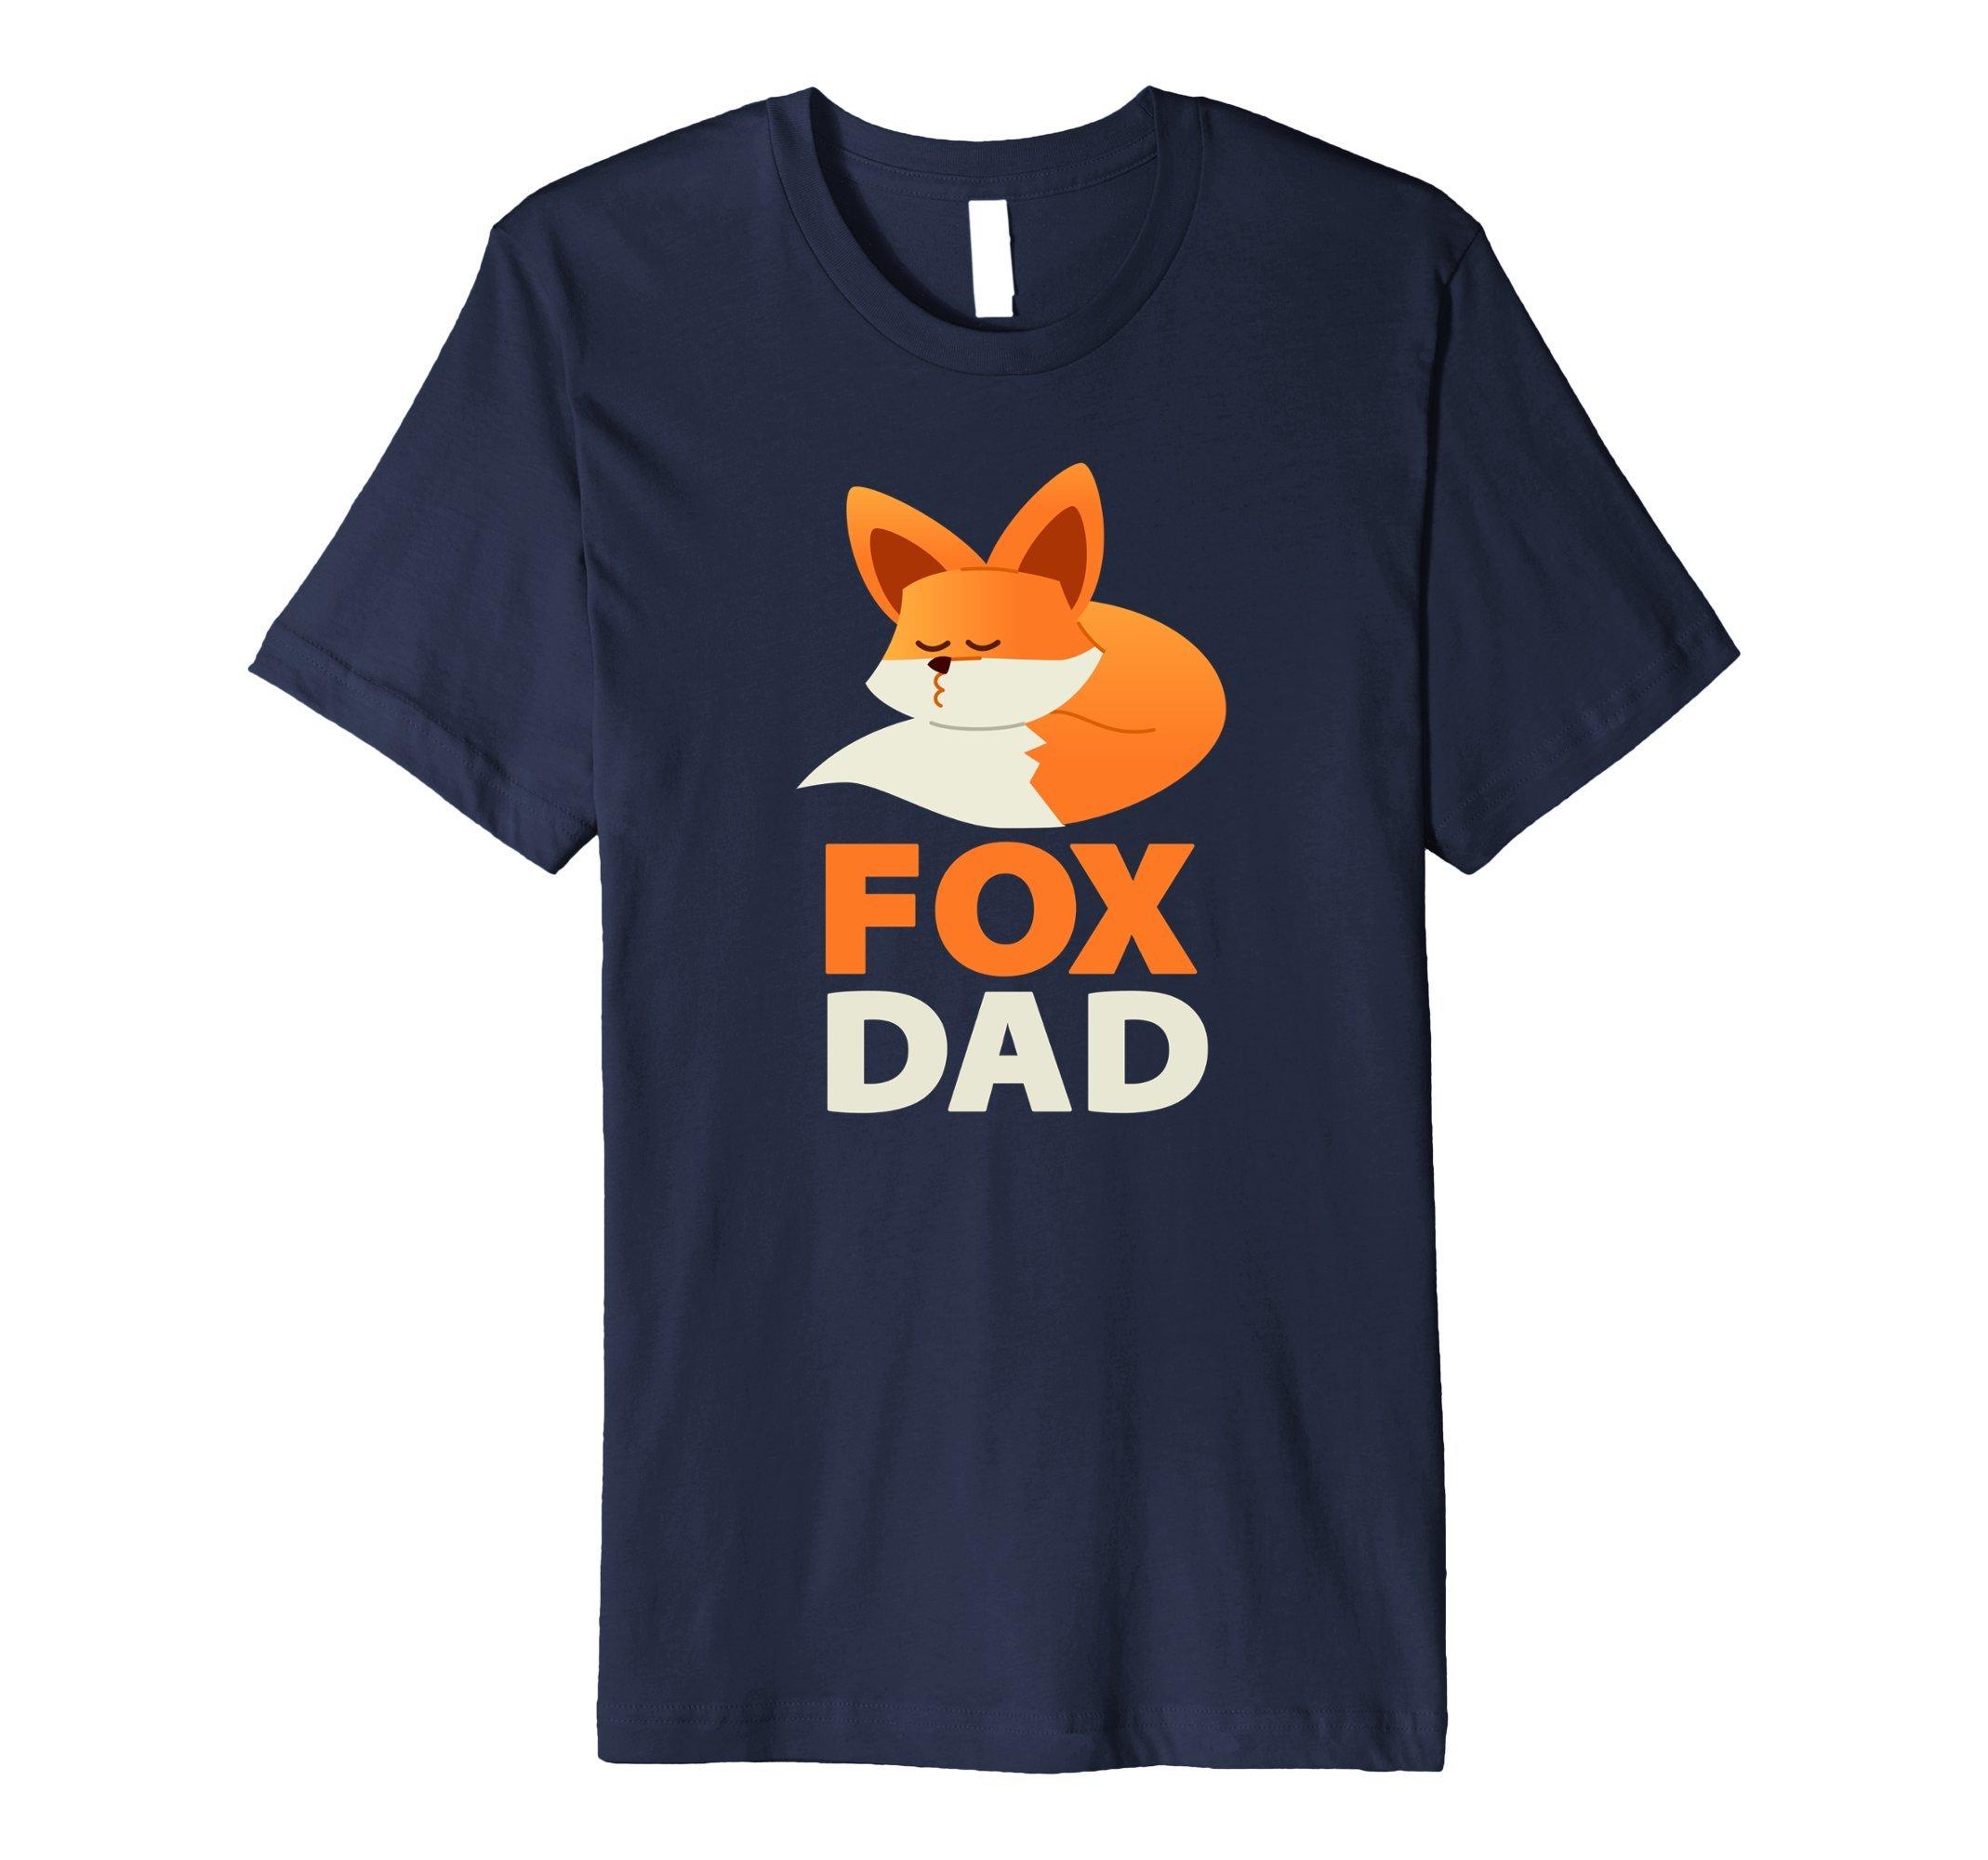 Mens Fox Dad Premium T-shirt Large Navy